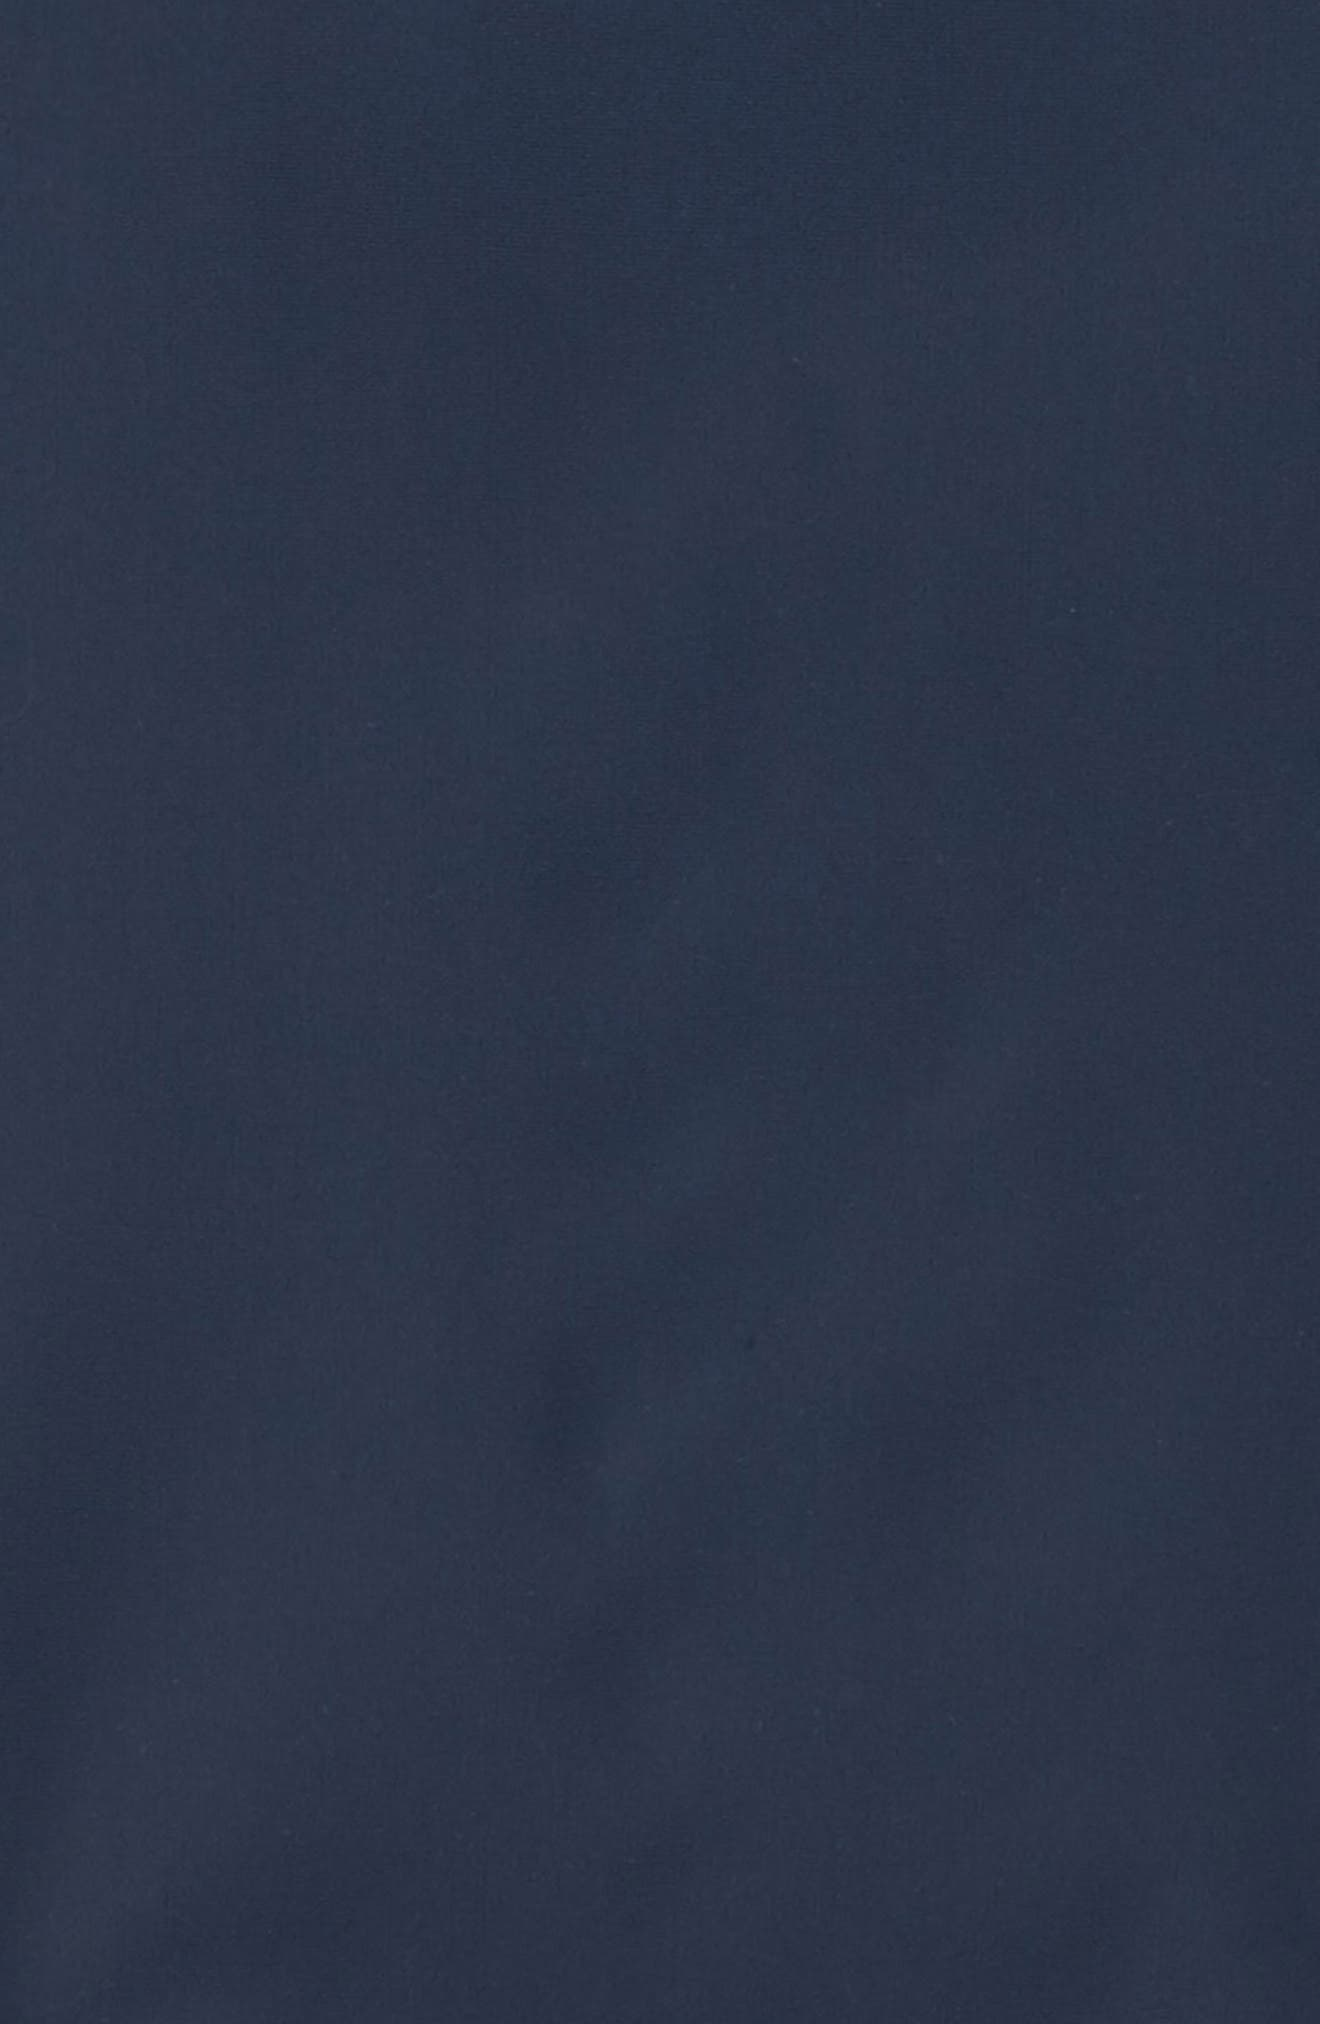 Raglan Long Sleeve Rashguard,                             Alternate thumbnail 2, color,                             Indigo